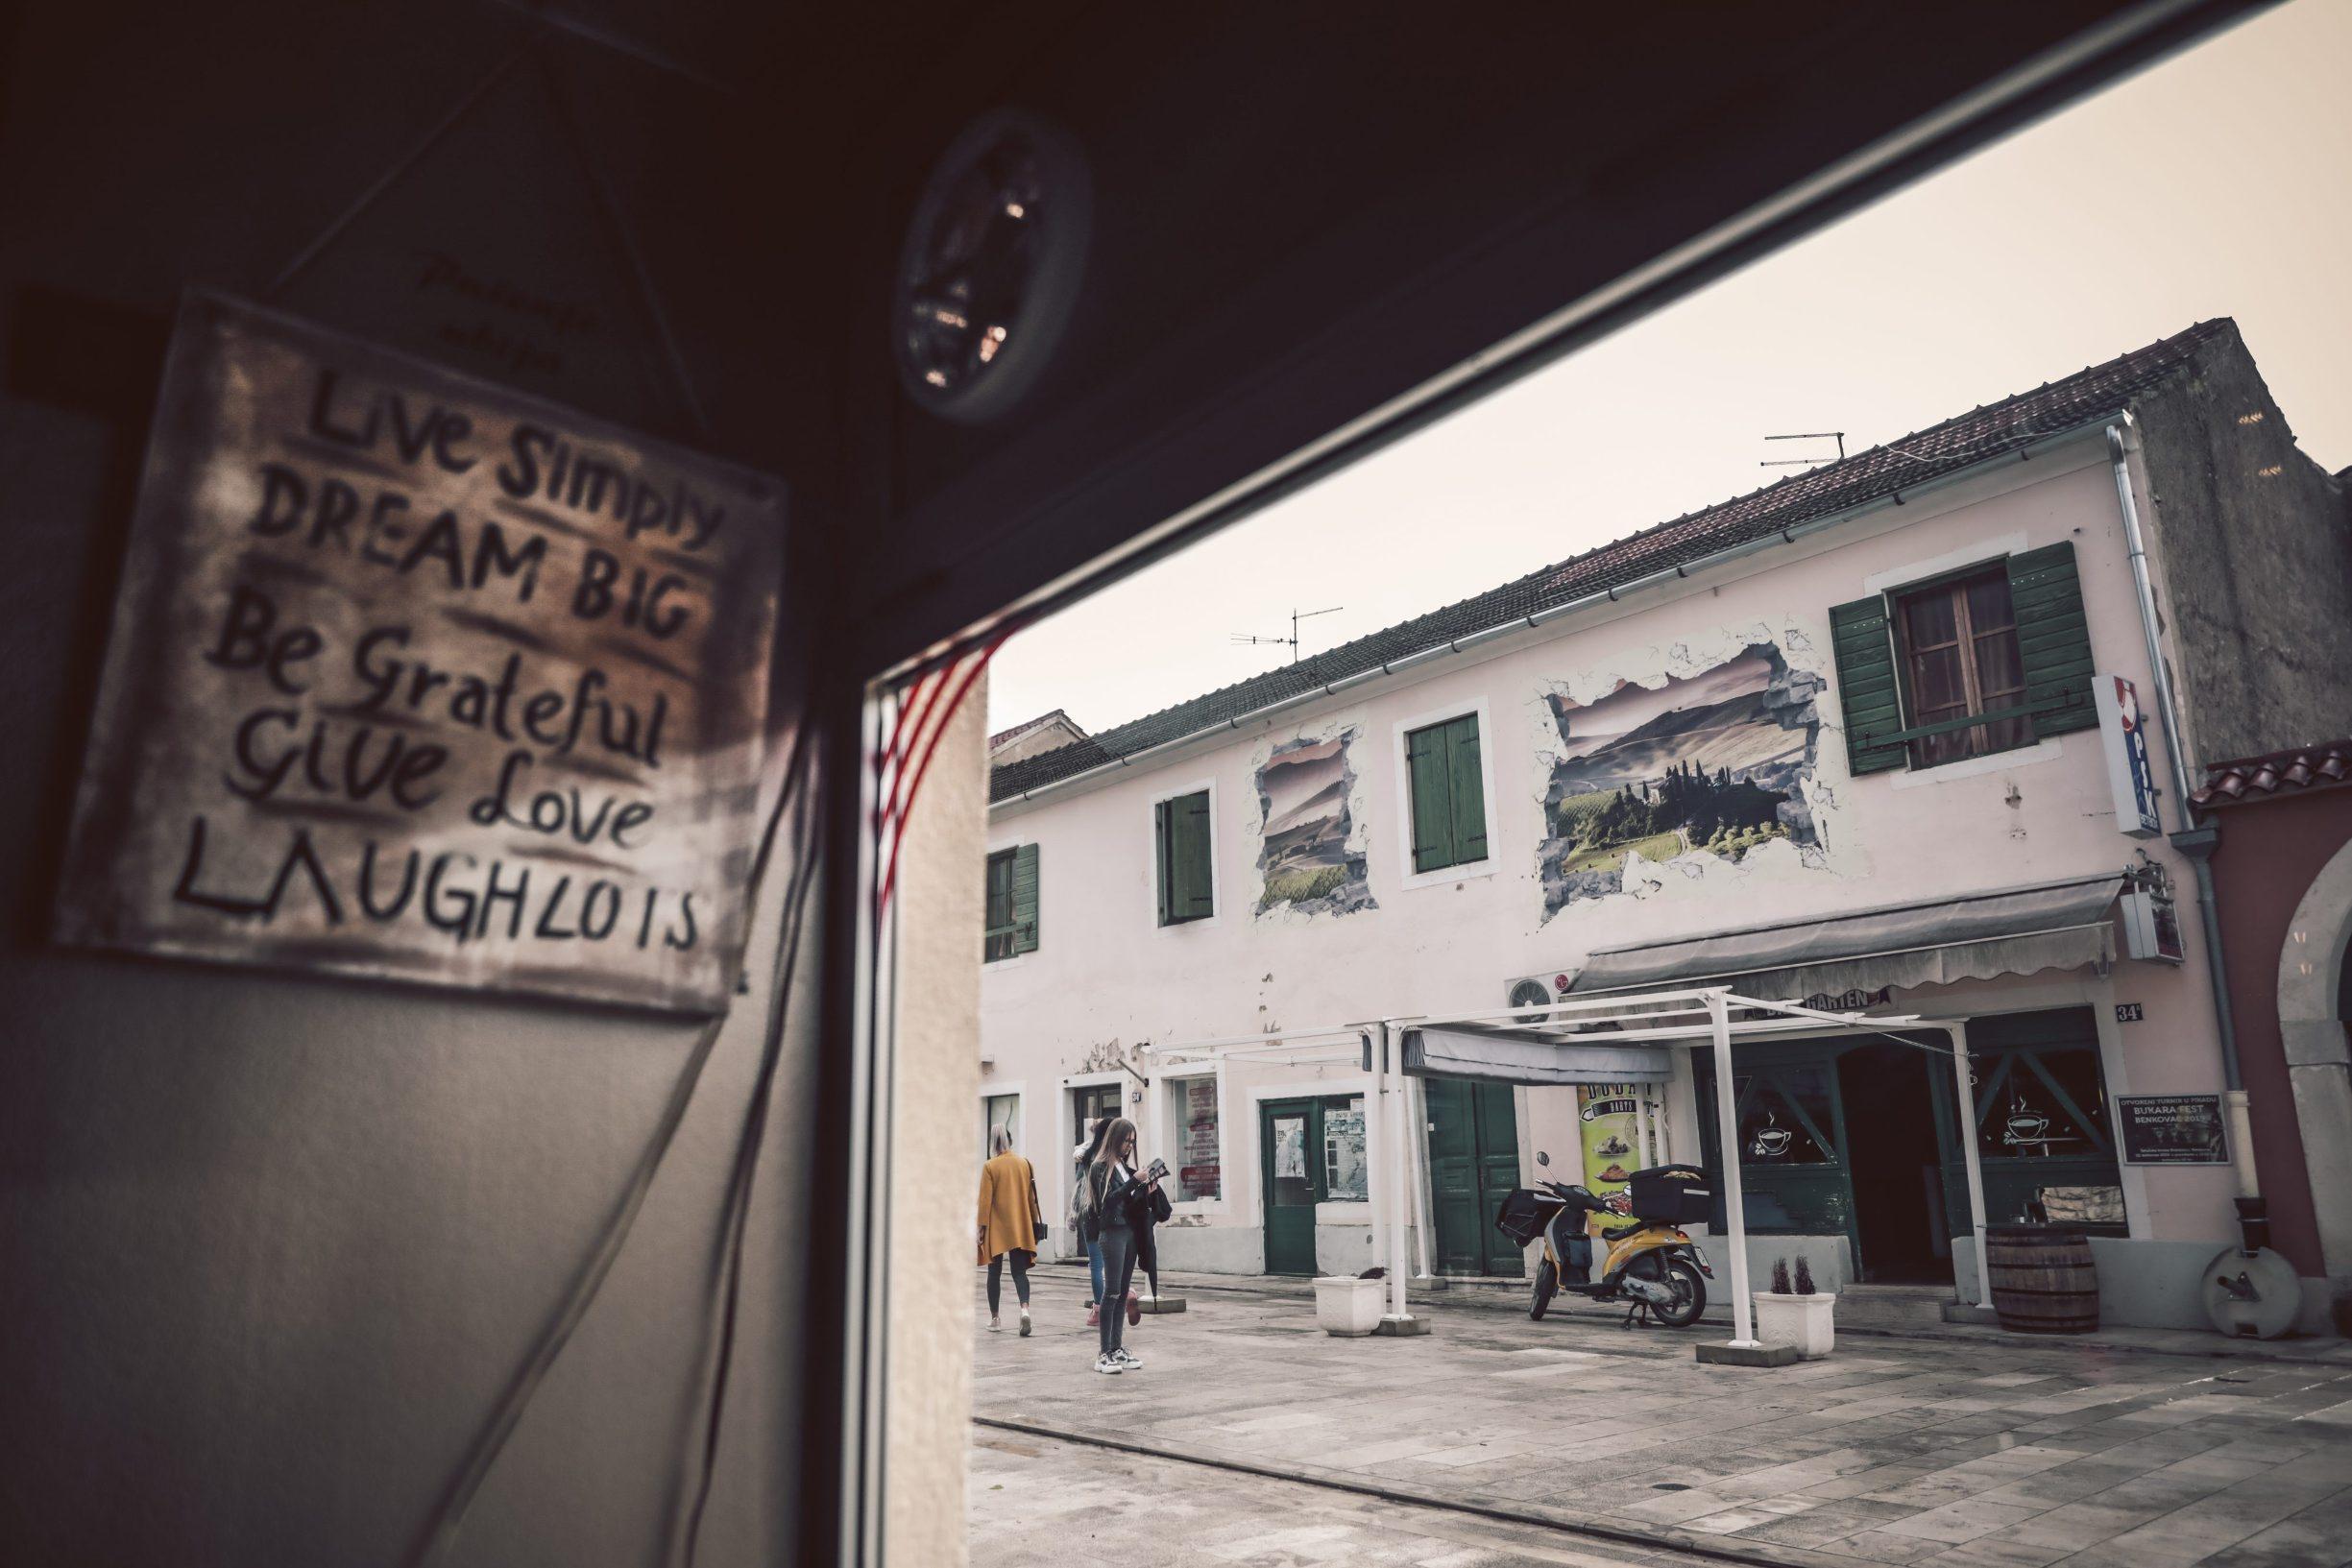 Benkovac, 031219 Reportaza o Benkovcu. Na fotografiji ulice Benkovca. Foto: Danijel Soldo / CROPIX